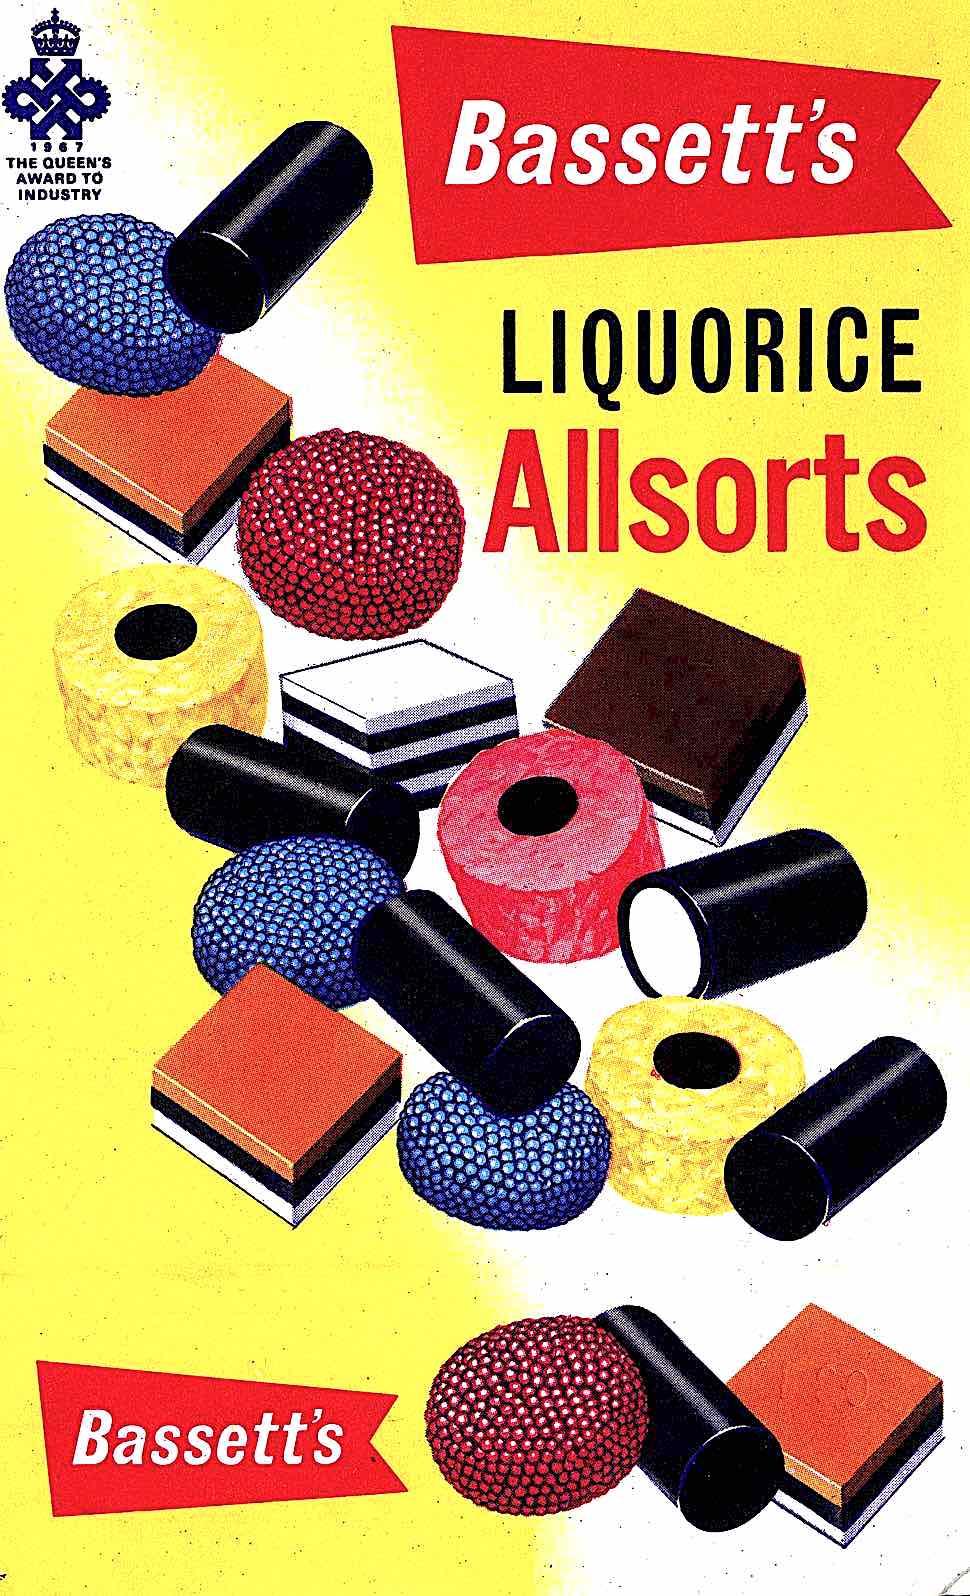 1970s British Bassett's Liquorice Allsorts candy, a color illustration